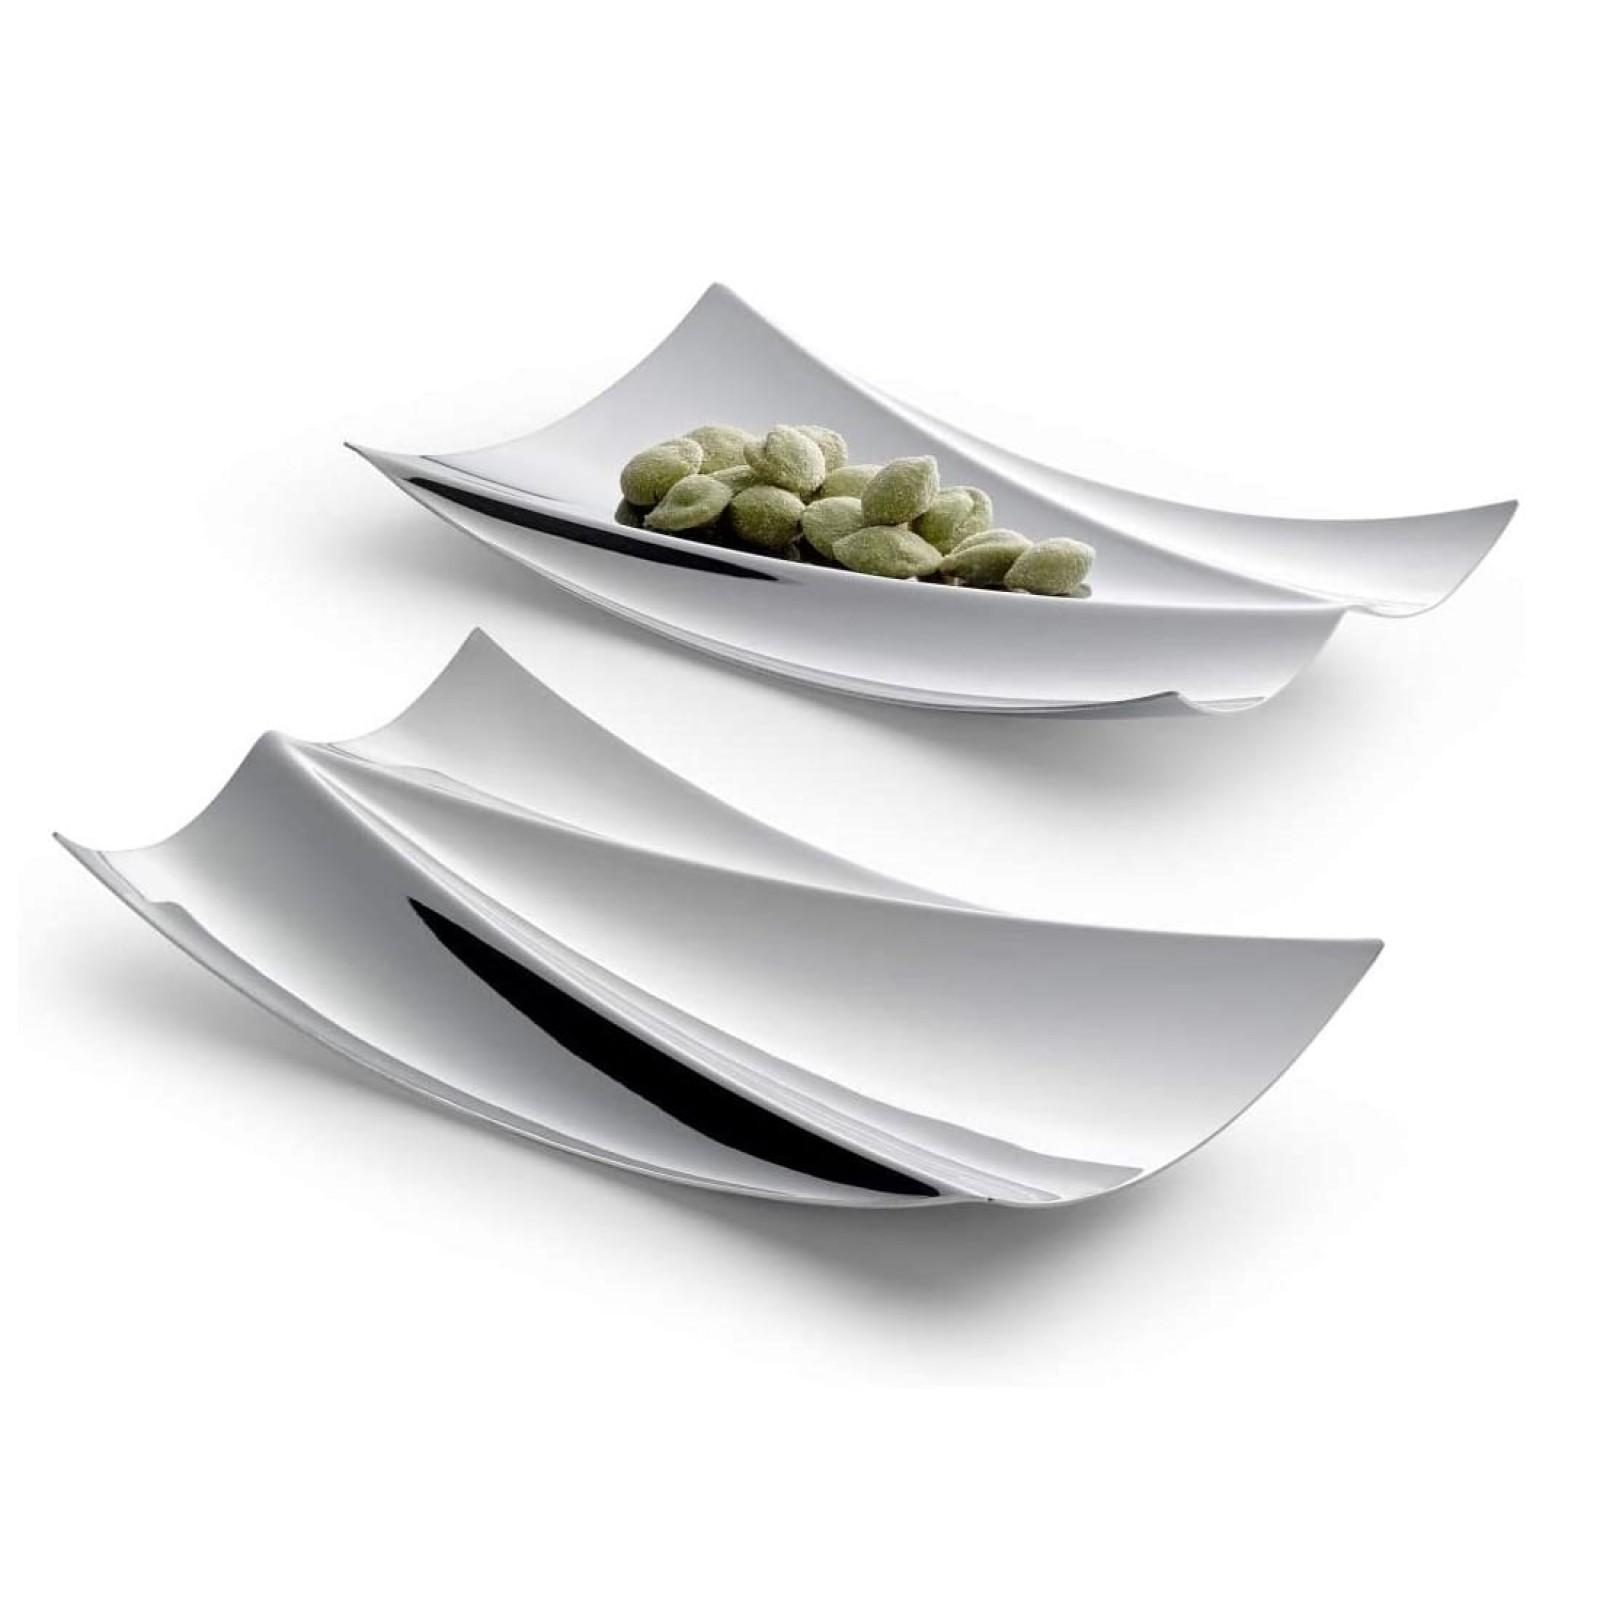 ELBHARMONIE Snack Bowl Set of 2 (Stainless Steel) - Philippi